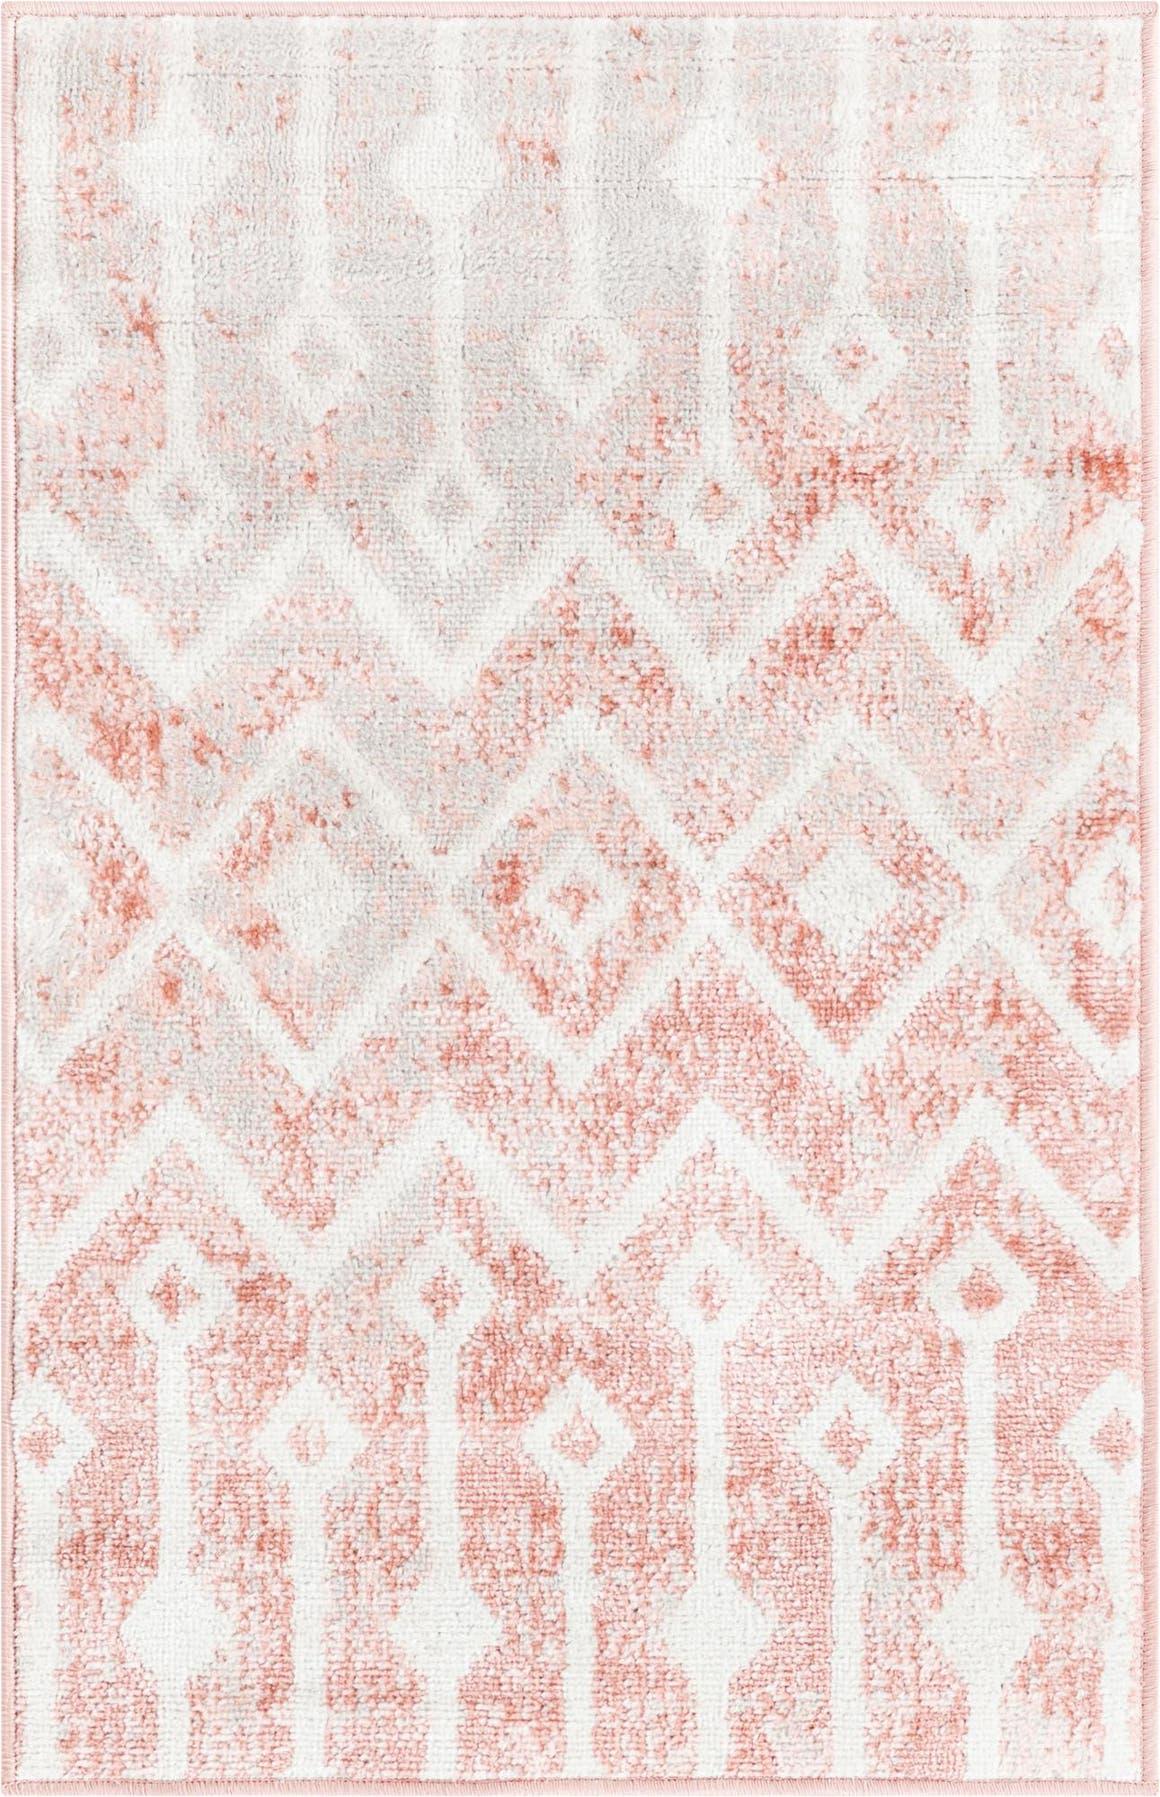 2' x 3' Bohemian Trellis Rug main image